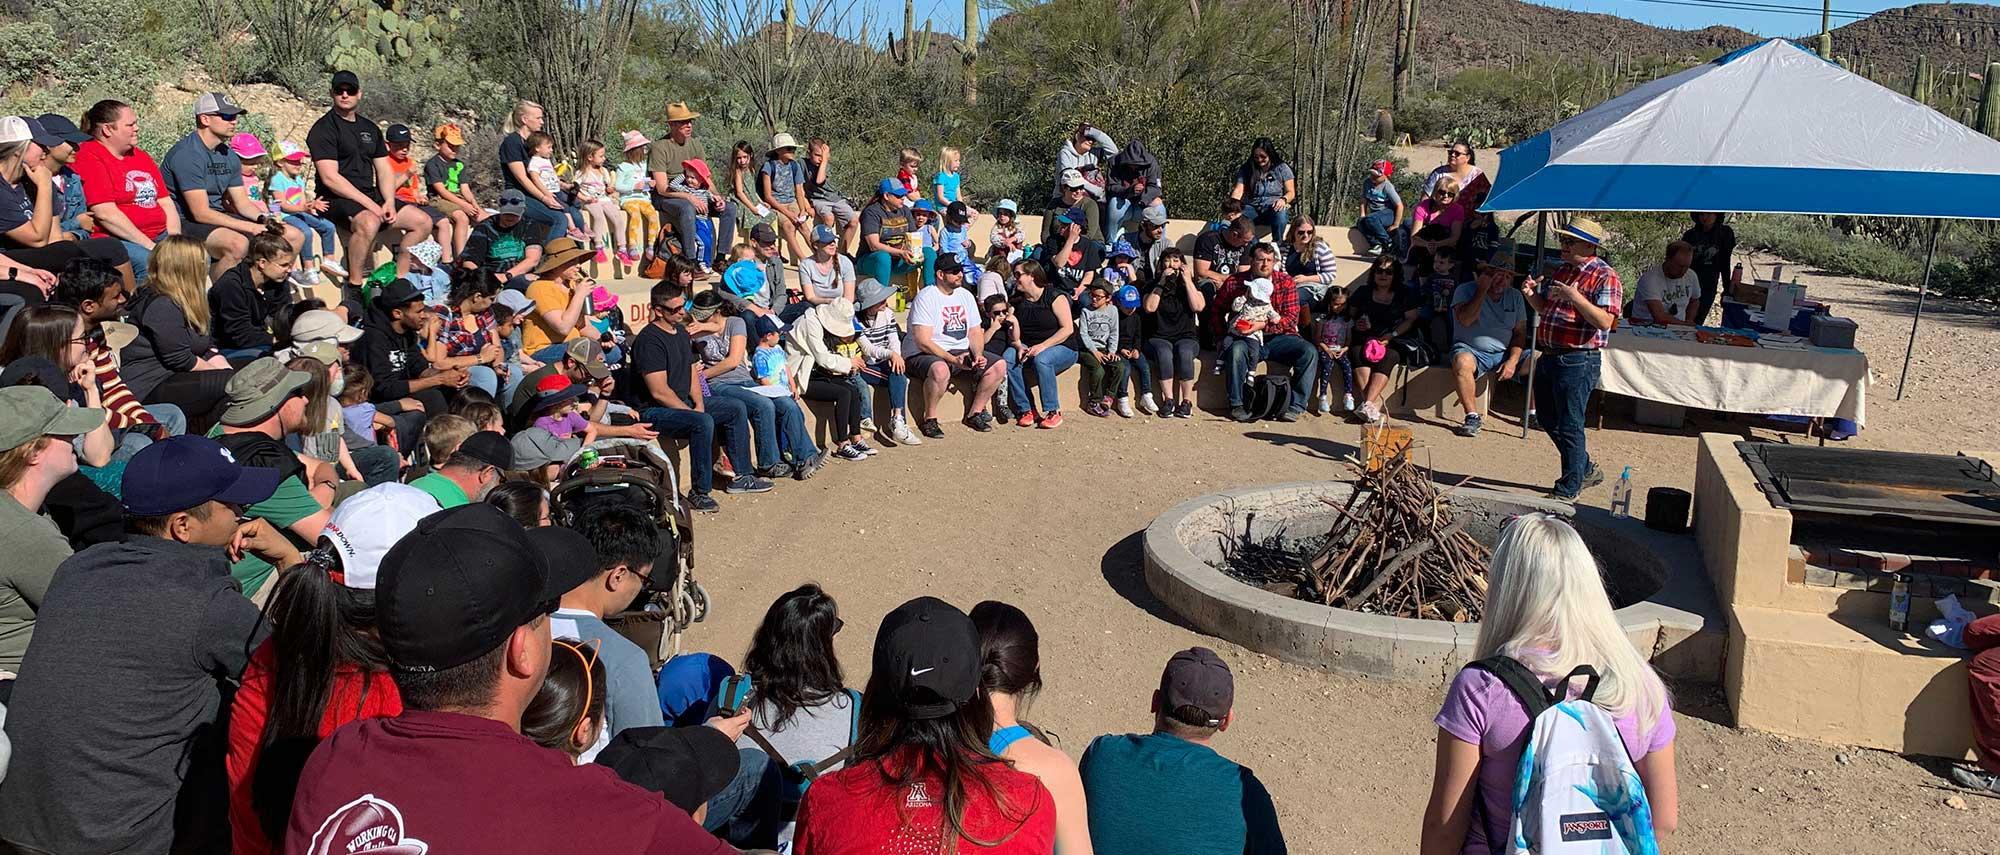 Preschool Nature Day 2020 at Camp Cooper, Tucson AZ